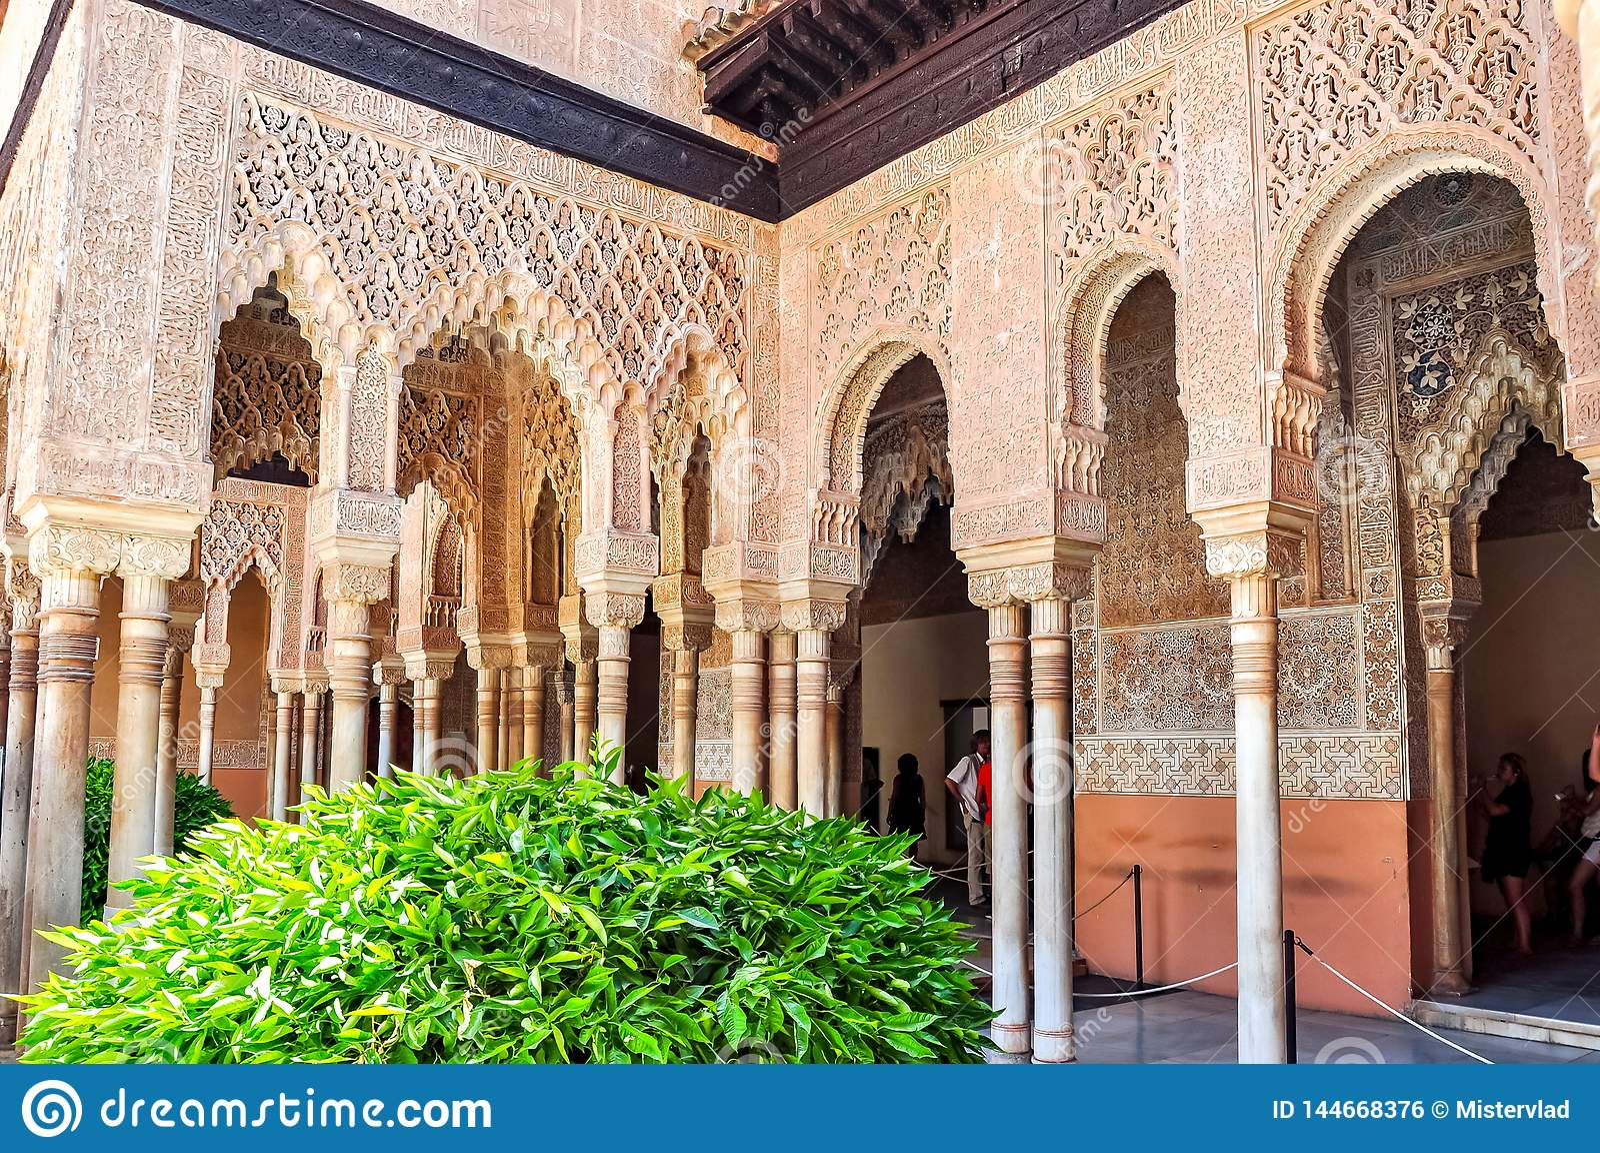 Interiors Of Alhambra Palace In Granada, Spain Stock Photo